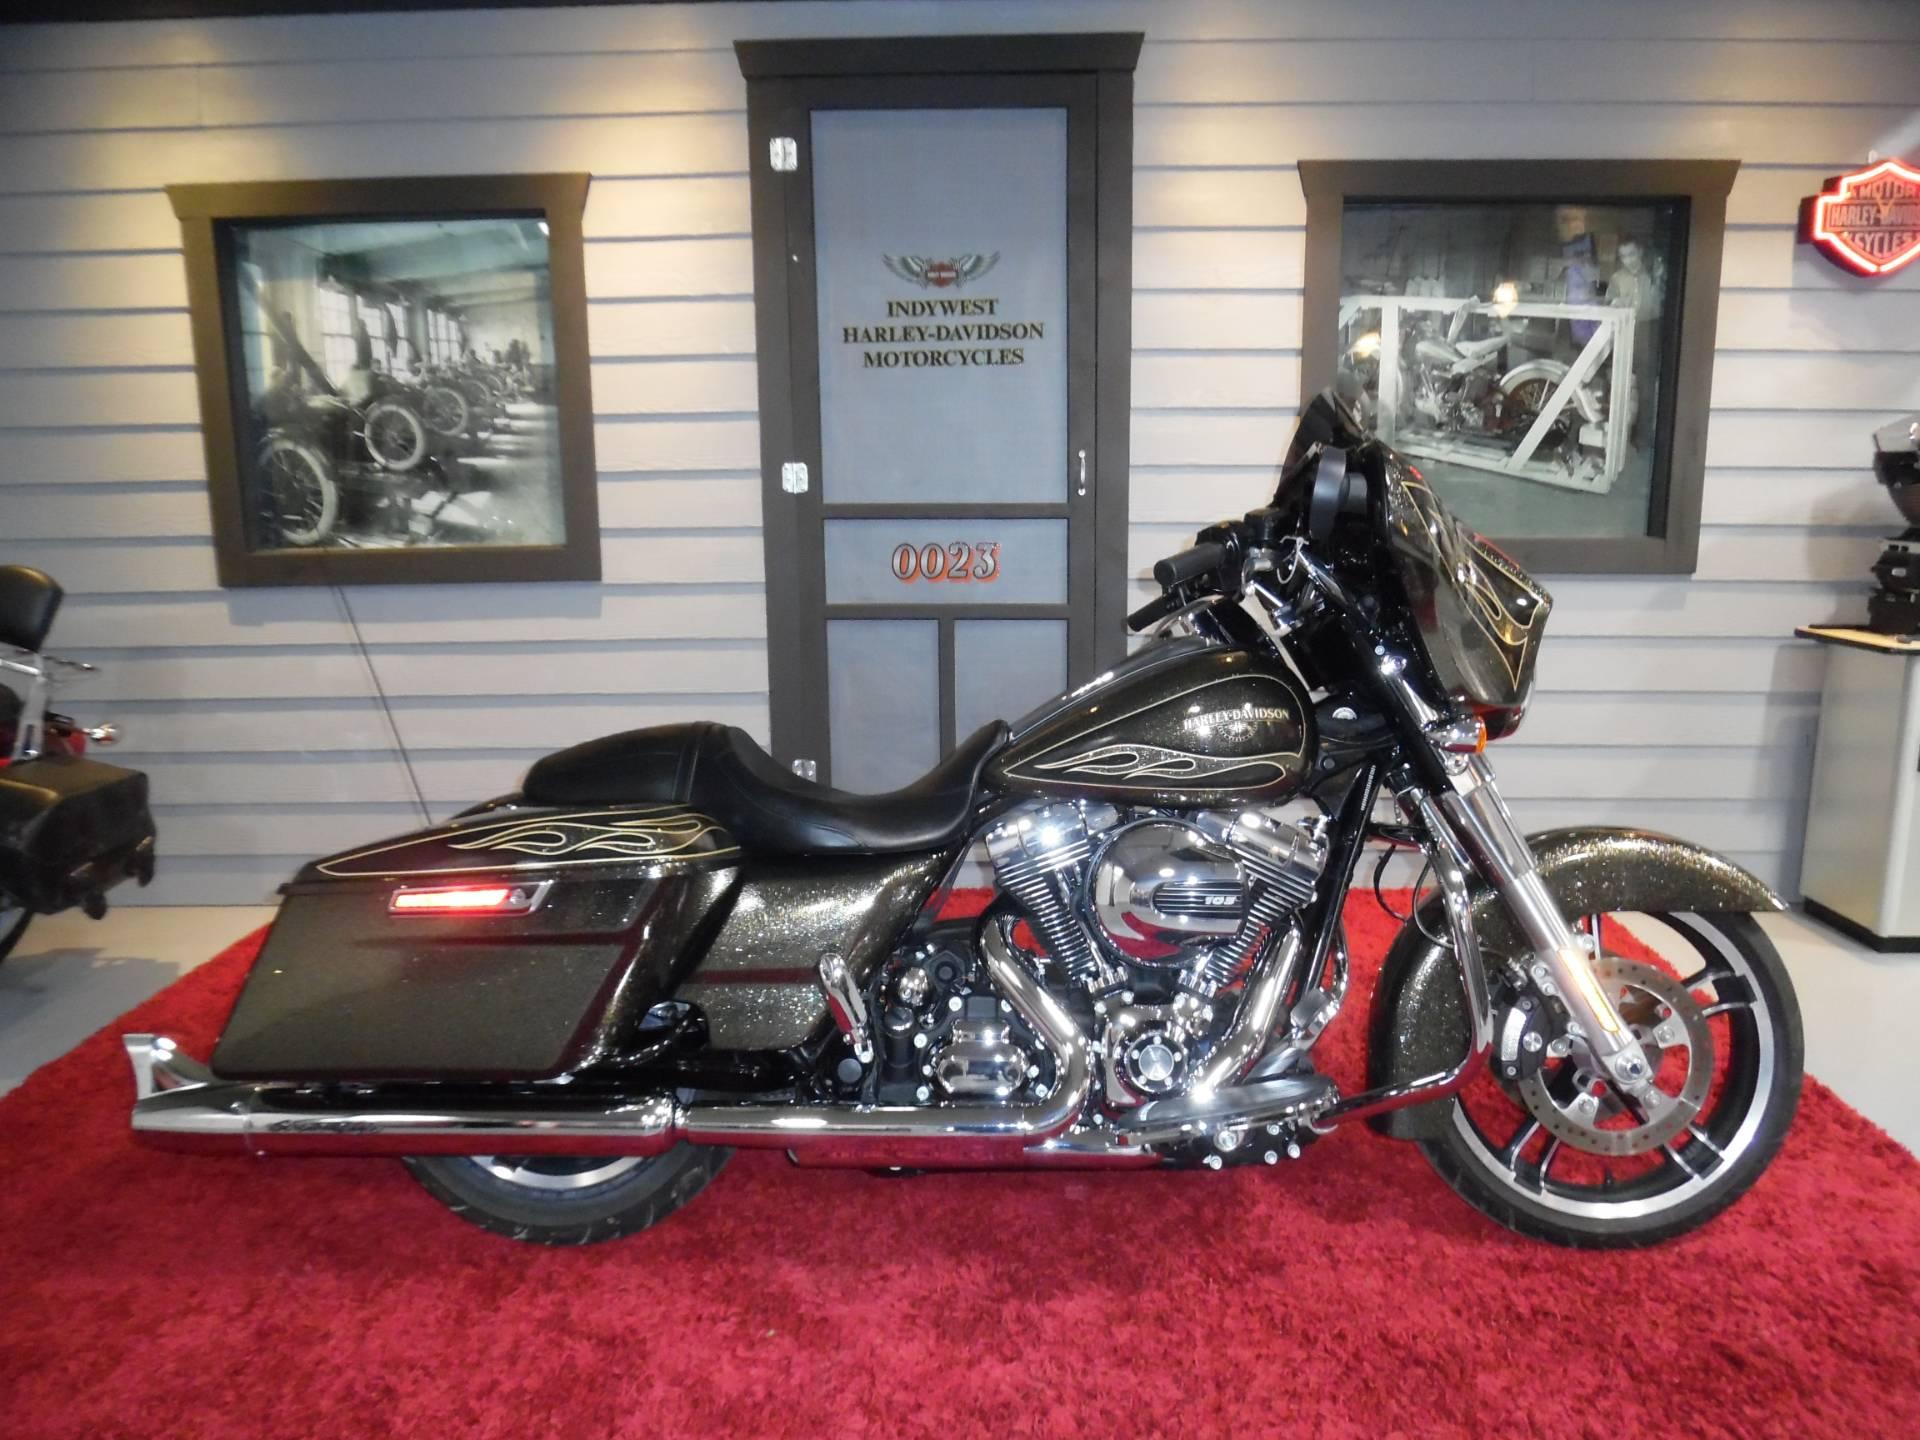 Used 2016 Harley Davidson Street Glide Special Hard Candy Black